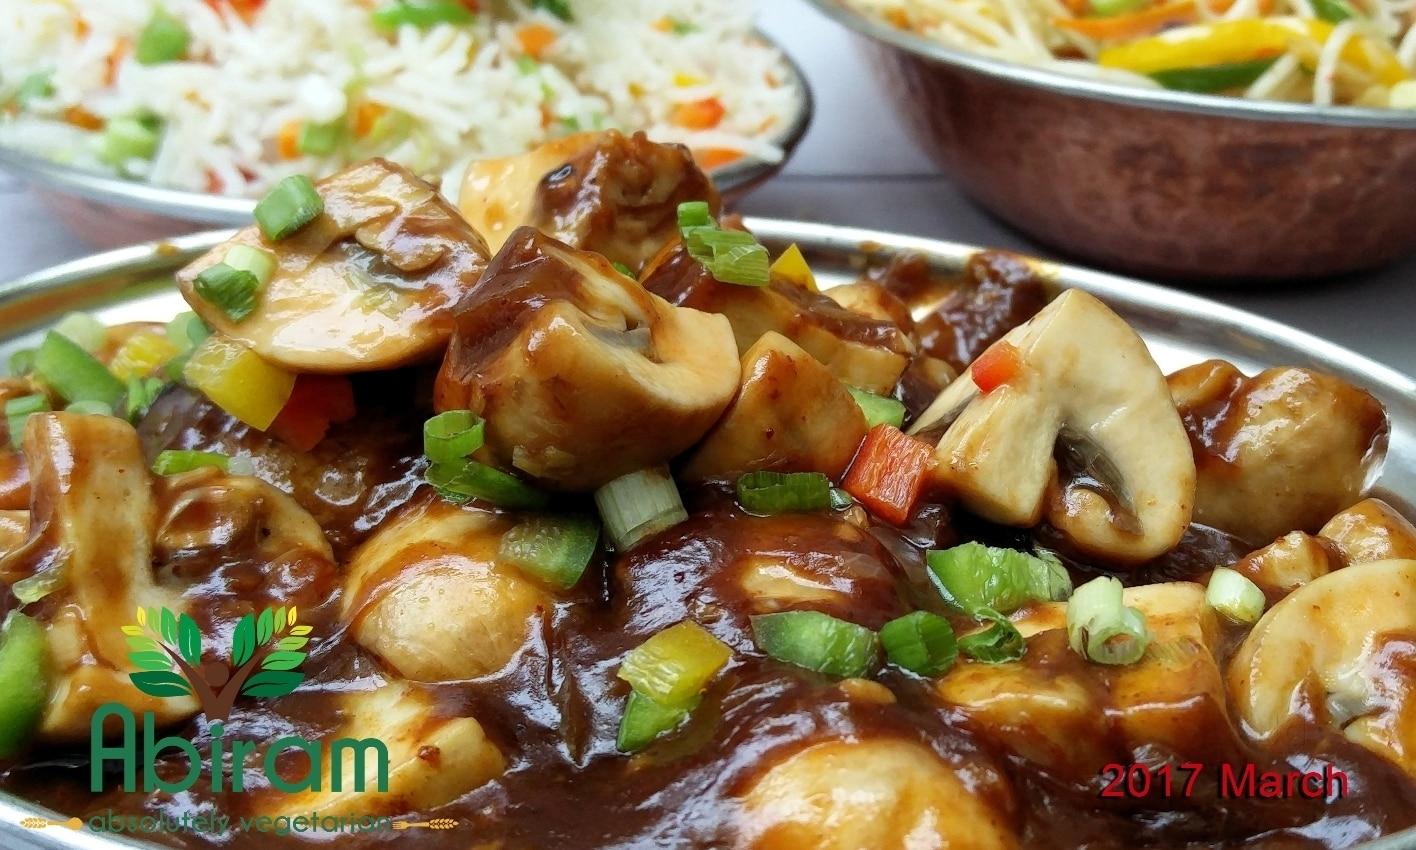 Top 20 Restaurants In Tirupadiripuliyur Bazaar Best